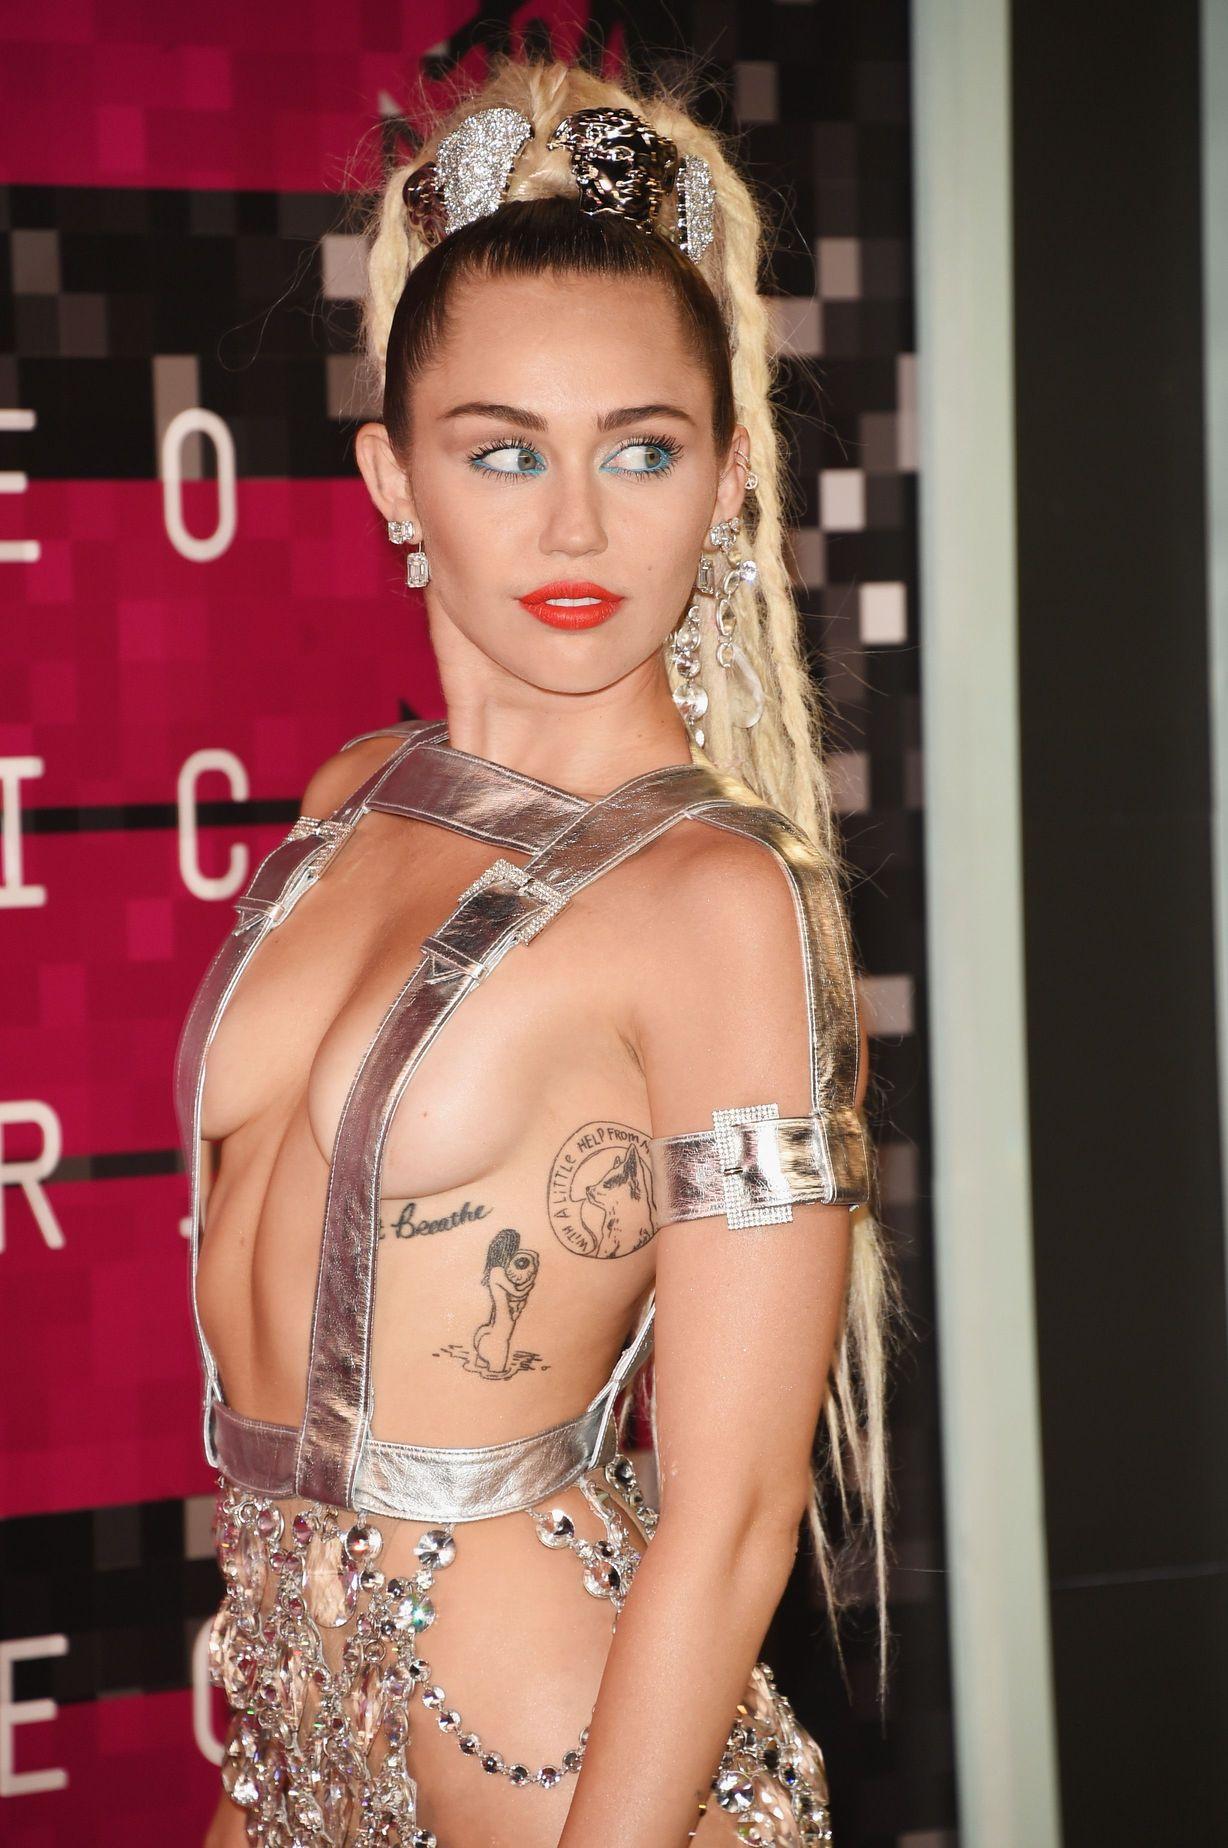 Miley Cyrus fappening leak